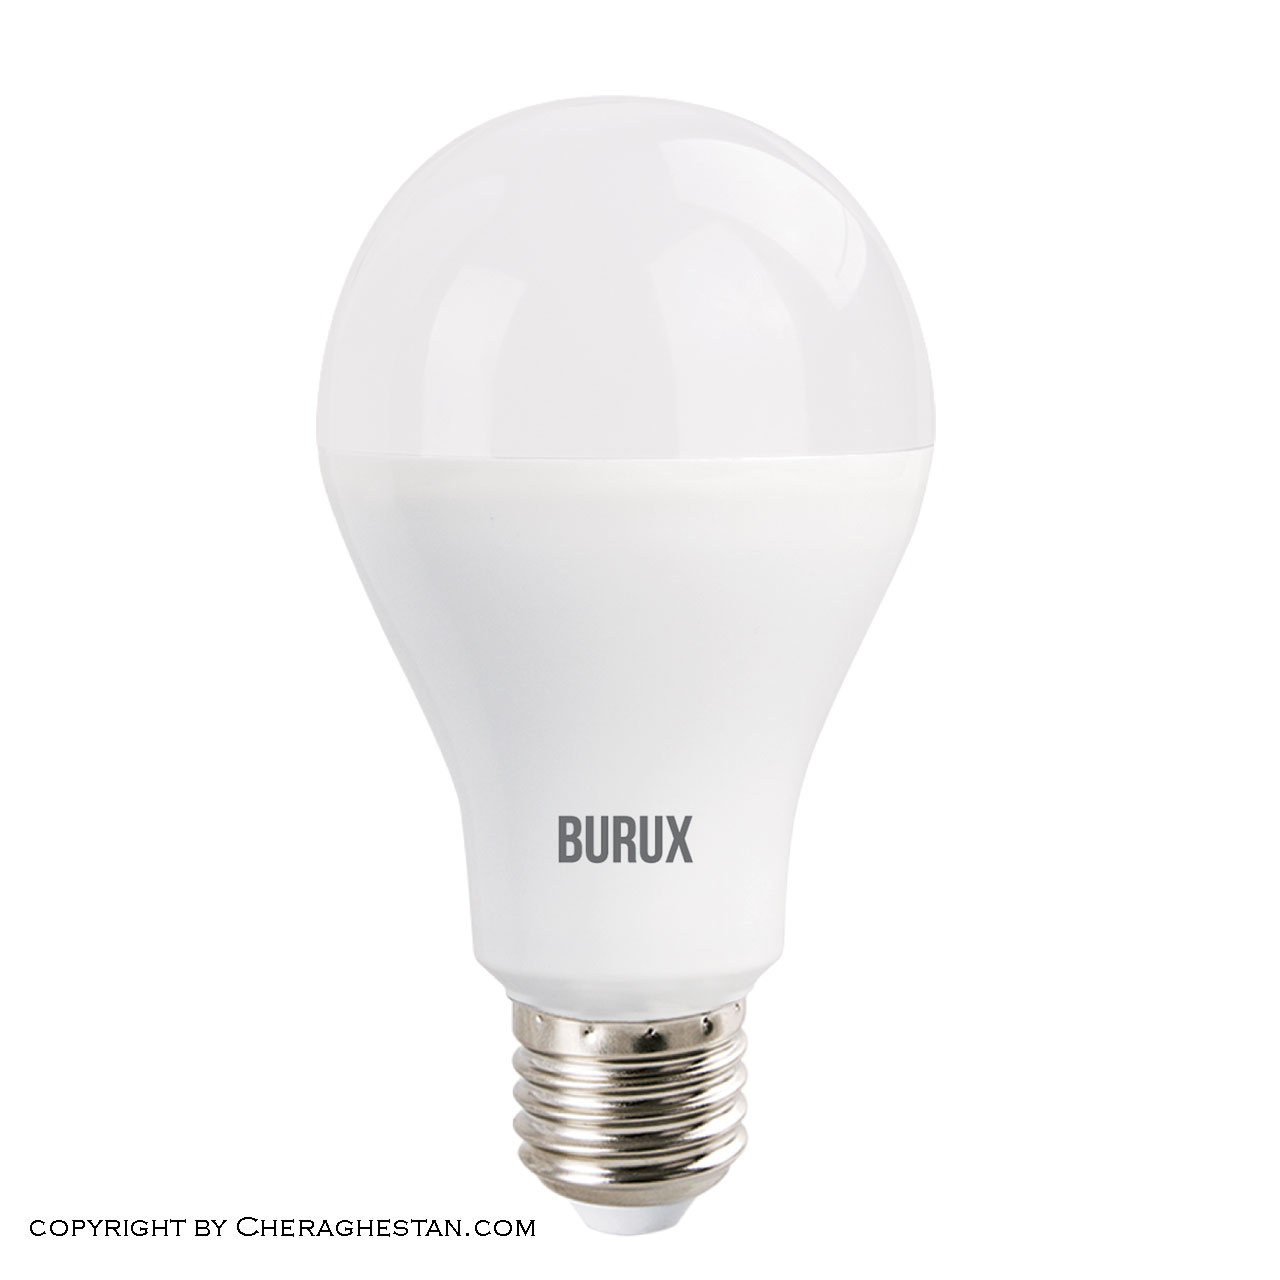 لامپ ال اي دي حبابی ۱۰ وات بروکس جنرال